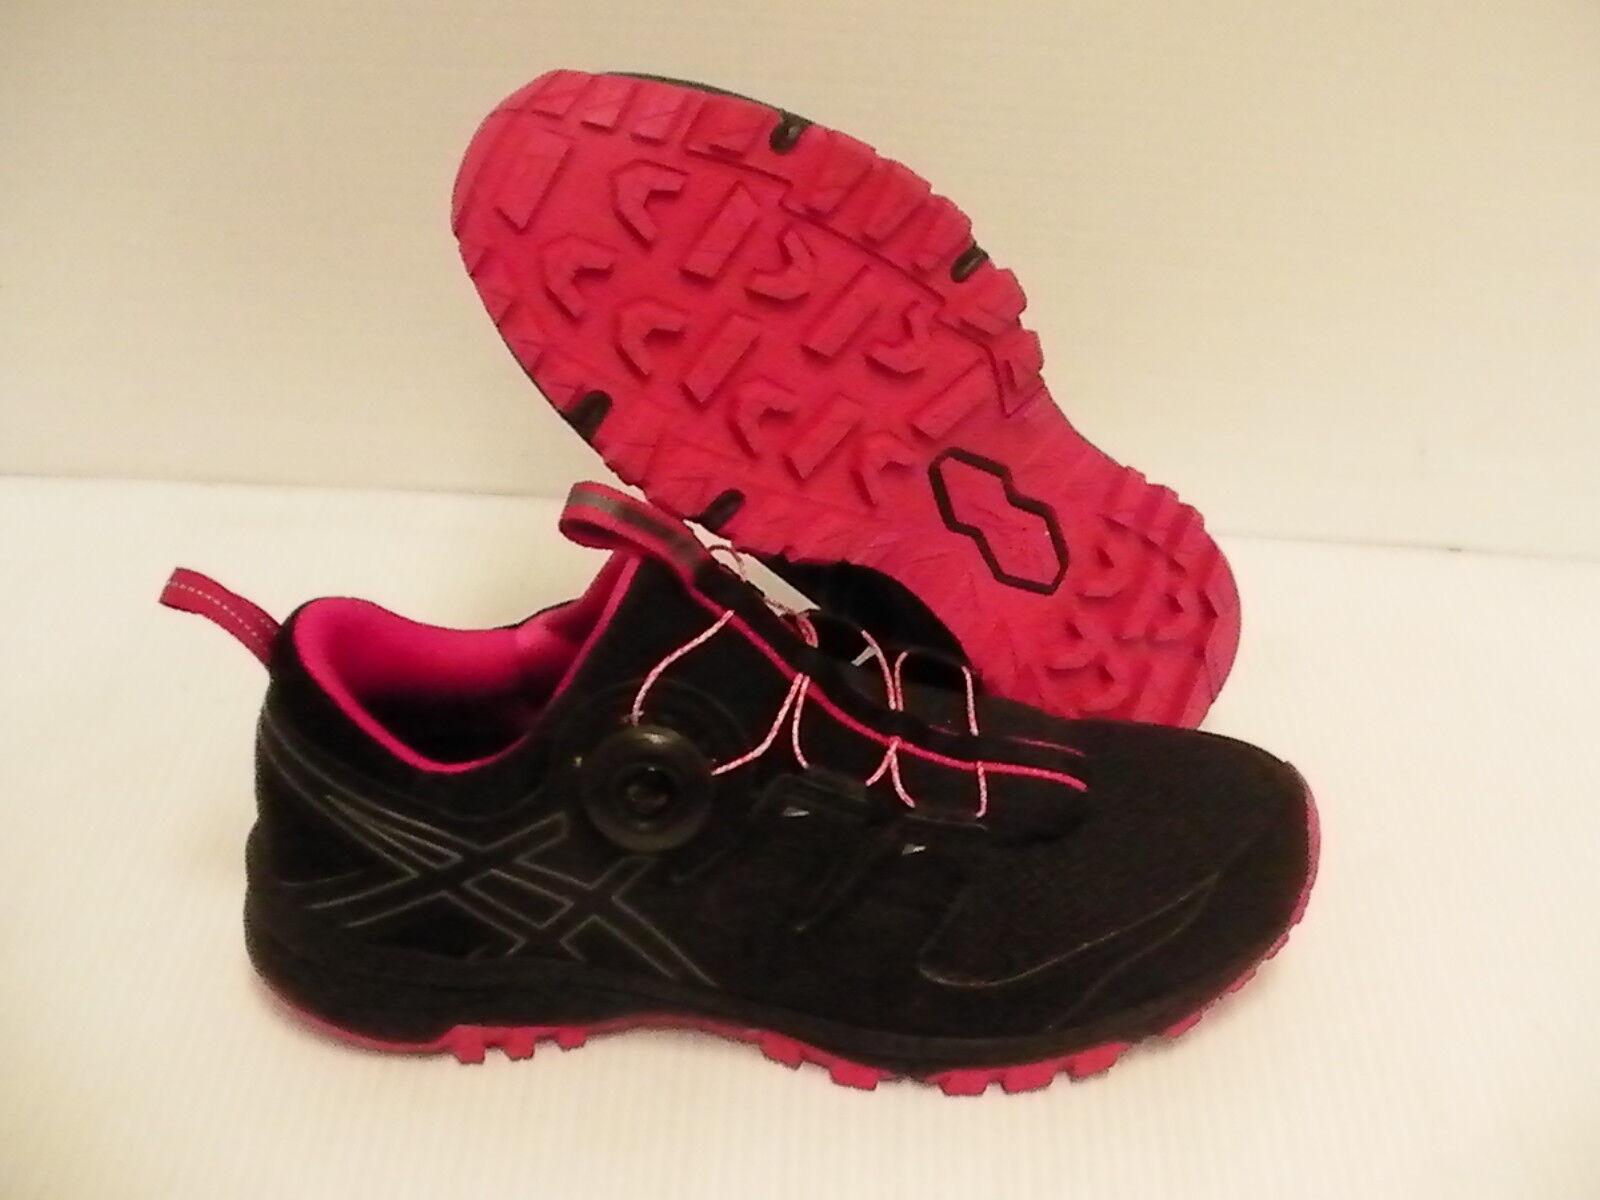 Asics gel Damens's gel Asics FujiRado running schuhe schwarz carbon cosmo pink Größe 8 us 011ced